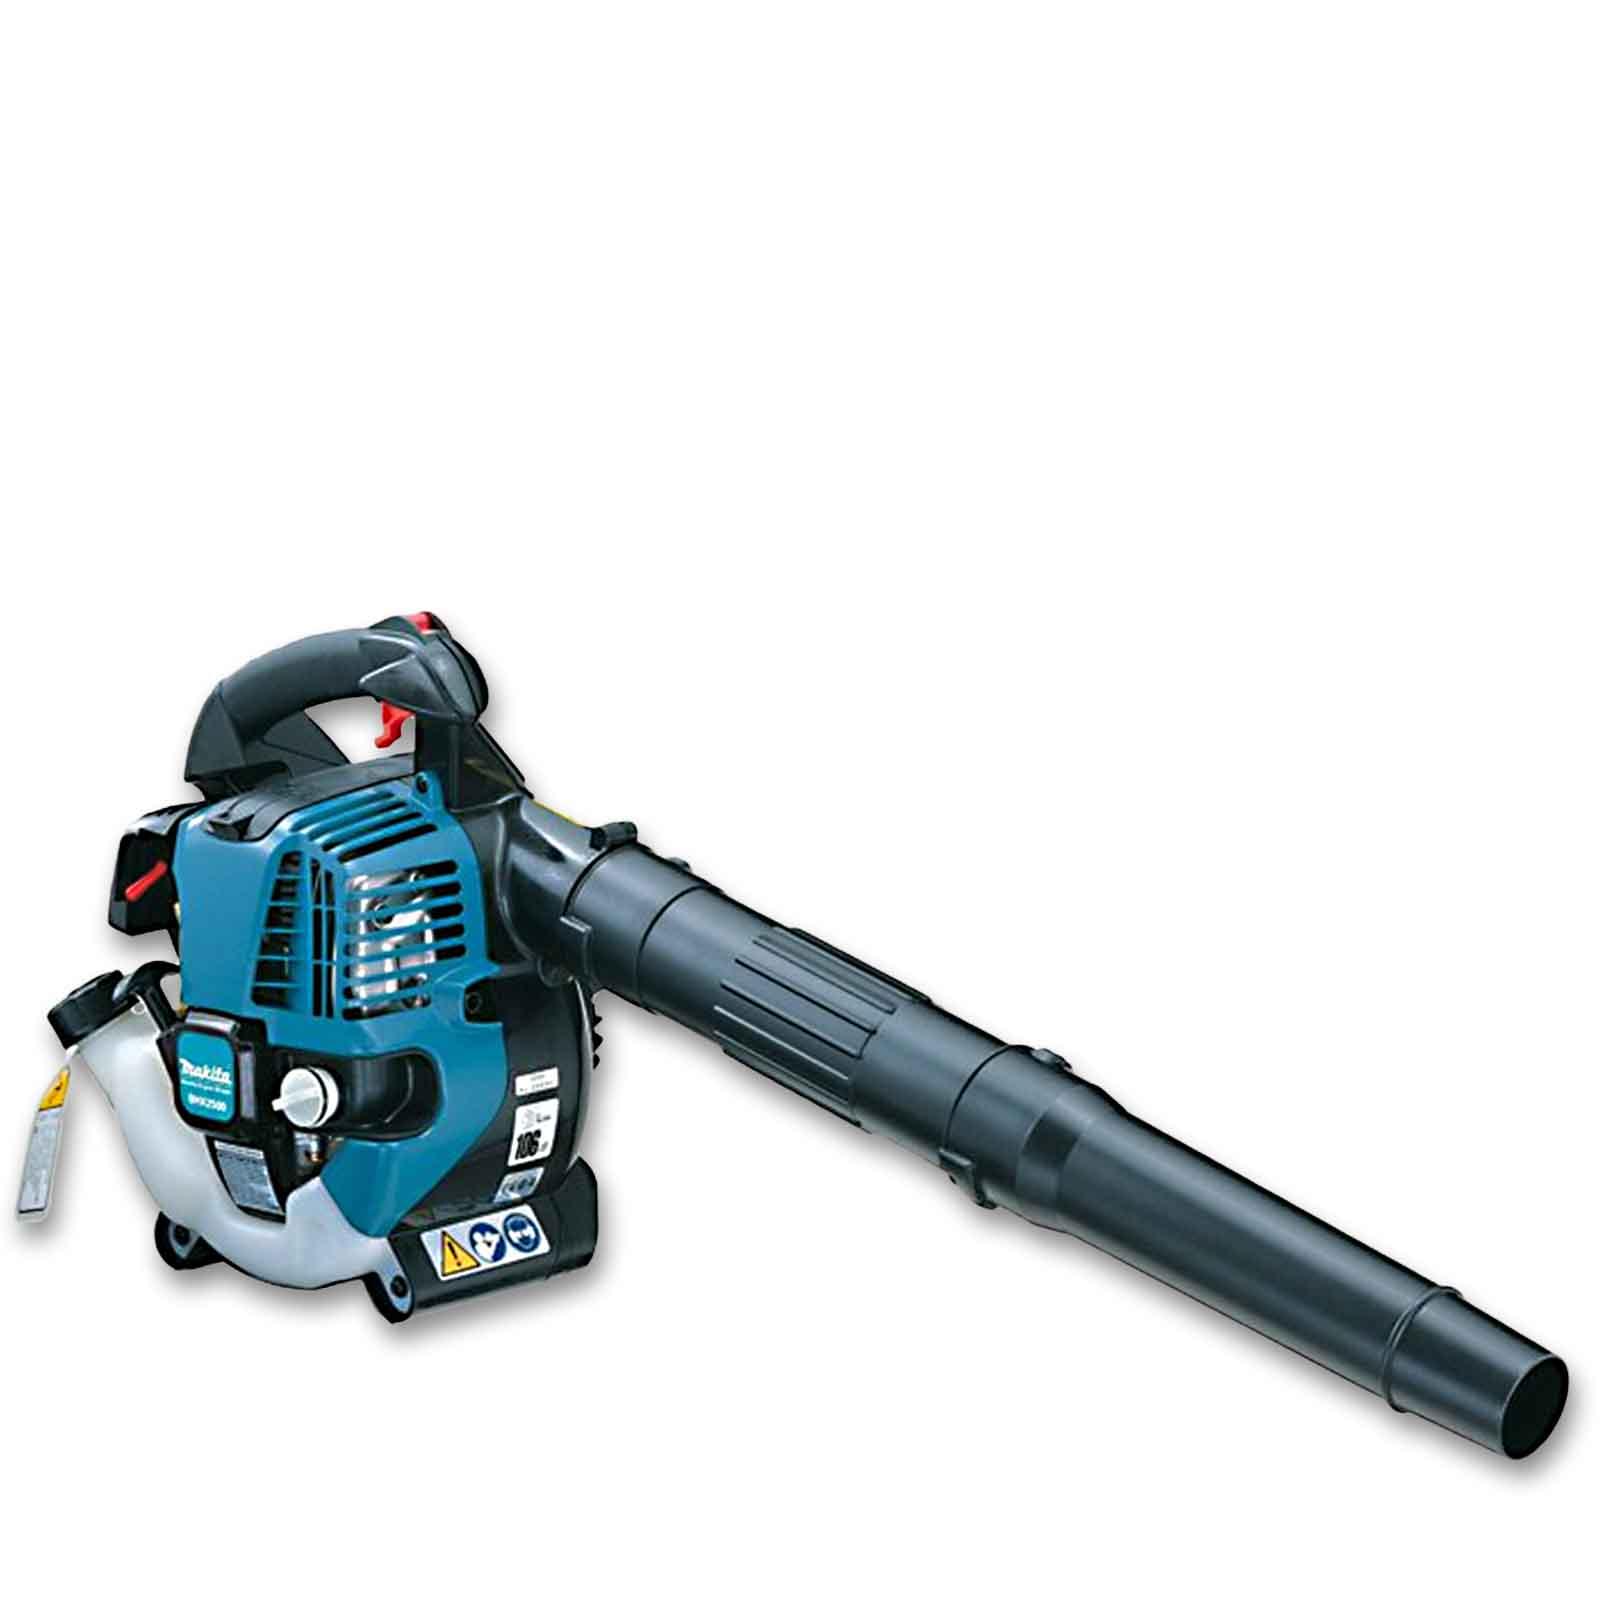 Supercharger Blower Oil Change: Makita Petrol Blower BHX2501 Leaf Vacuum Optional 131013